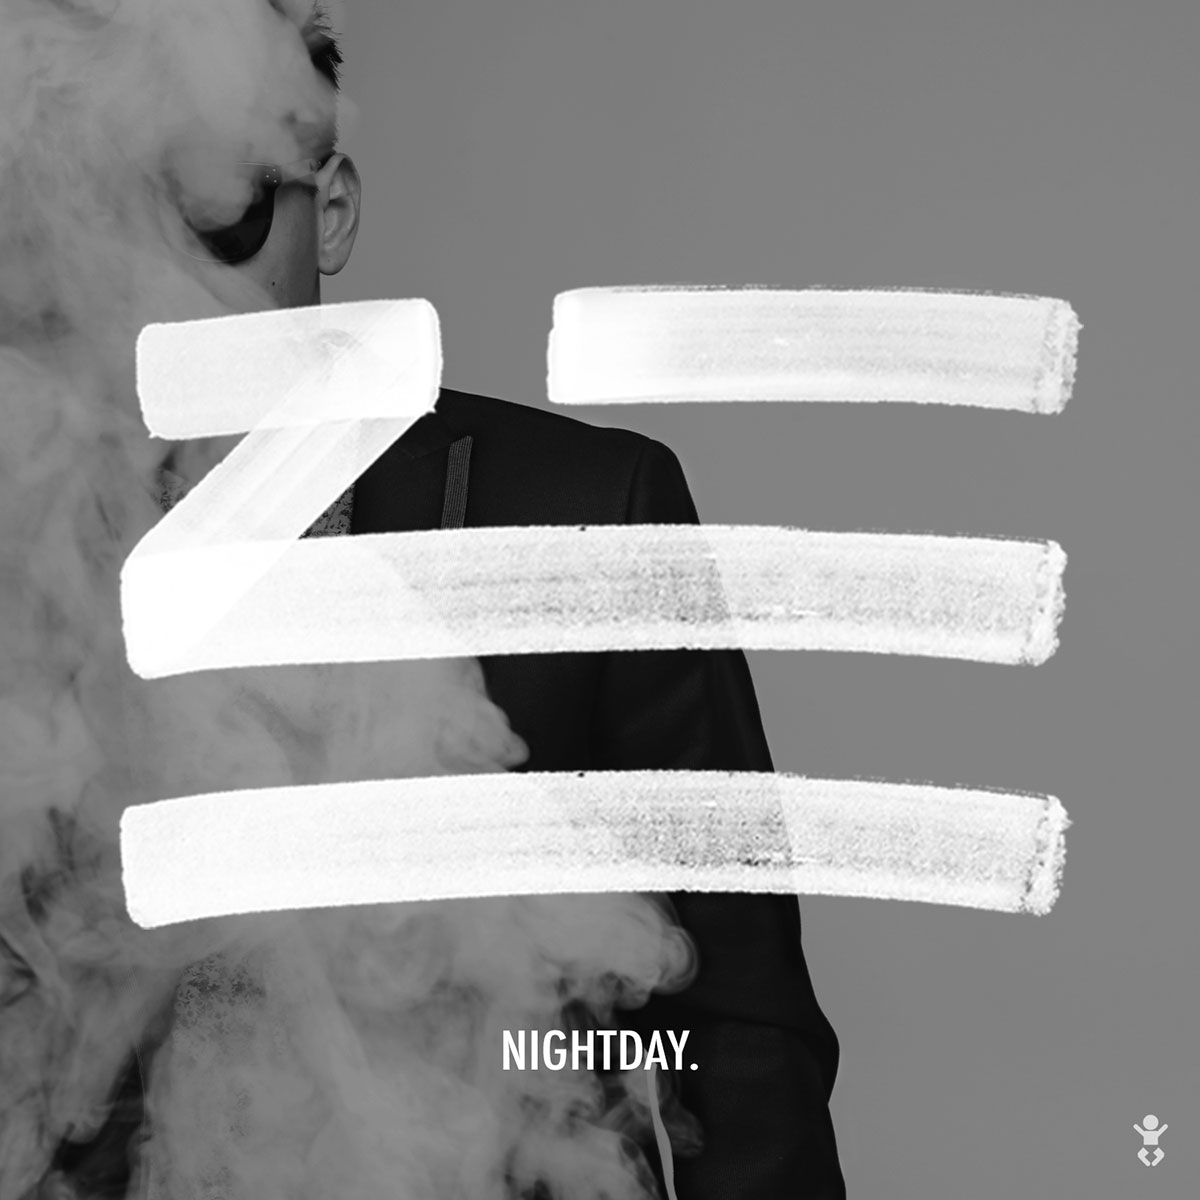 Zhu - Nightday